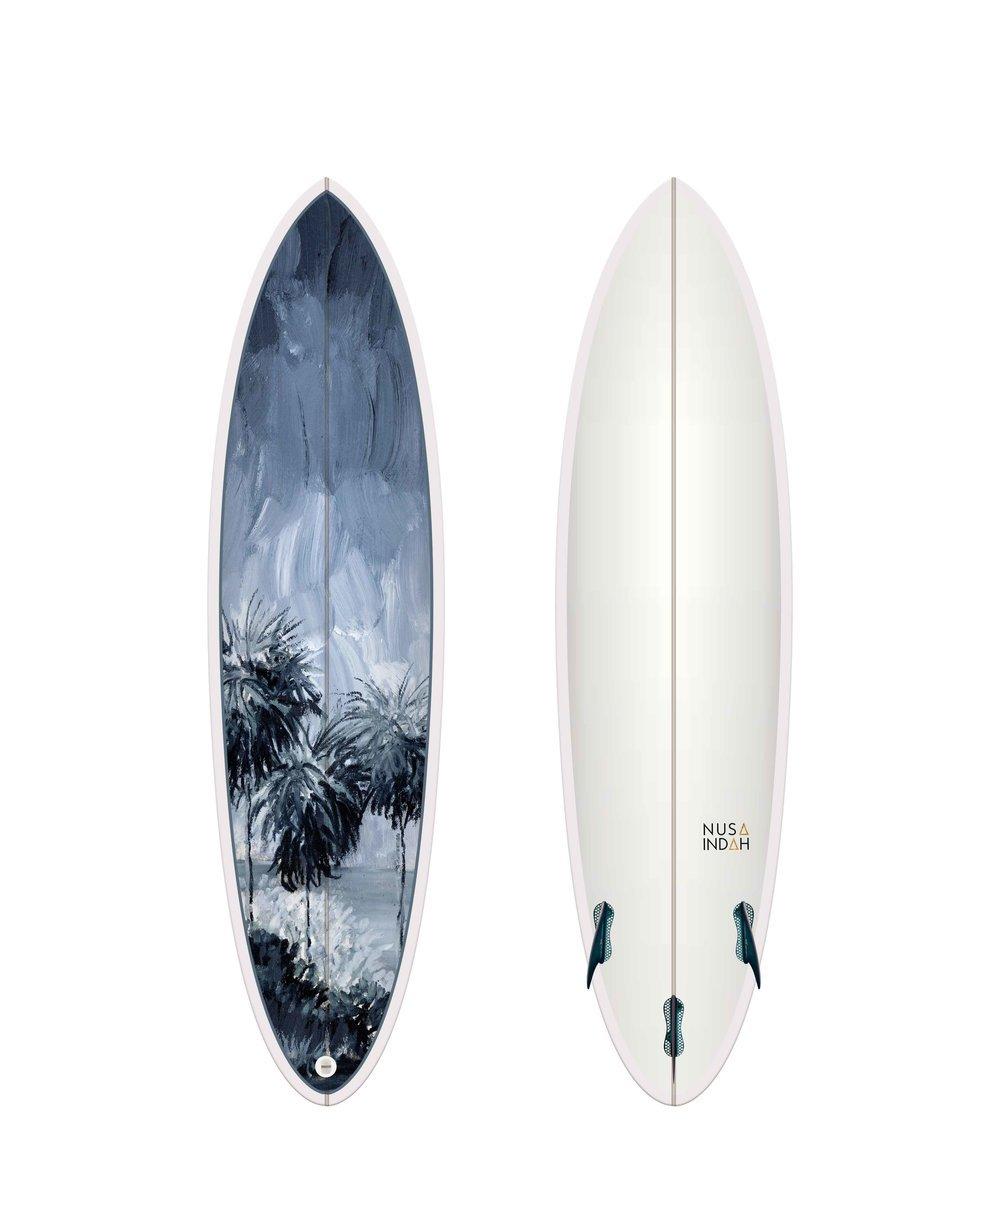 NUSA INDUH - Barefoot Beach Surfboard